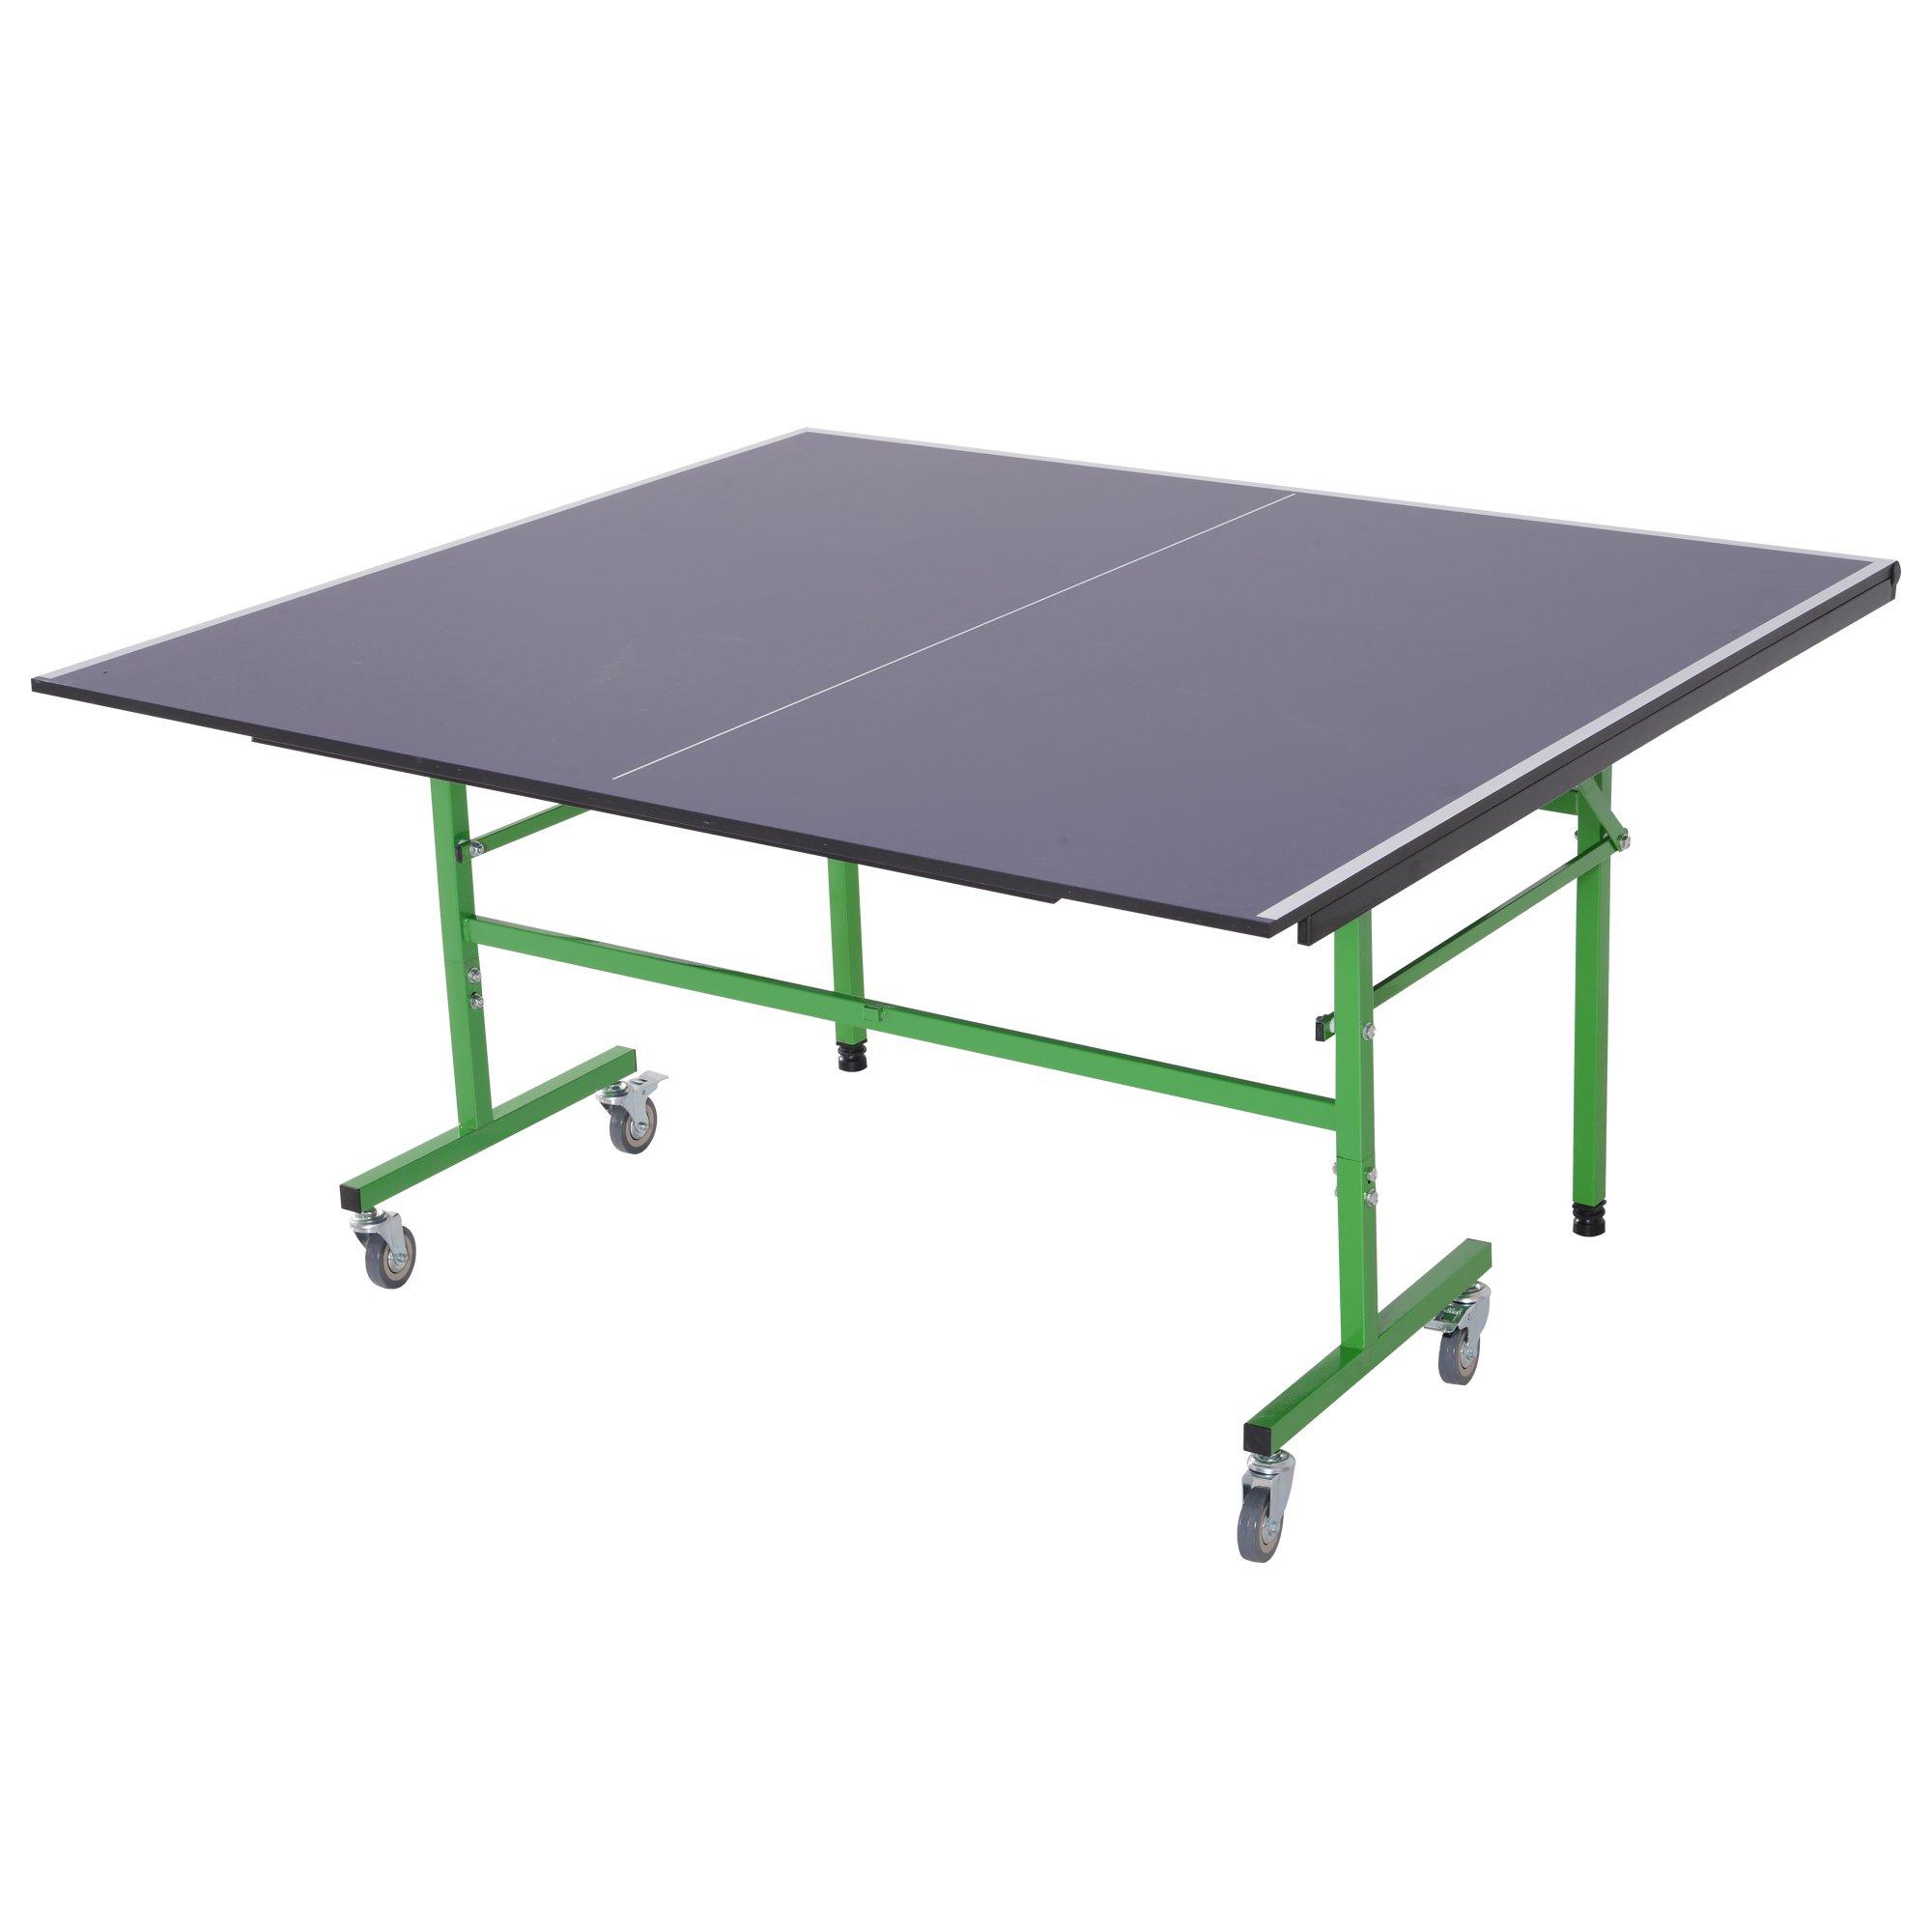 Patas Pong Ruedas Con Azul De Acero Ajustables Mesa Plegable Ping lK1T3uFJc